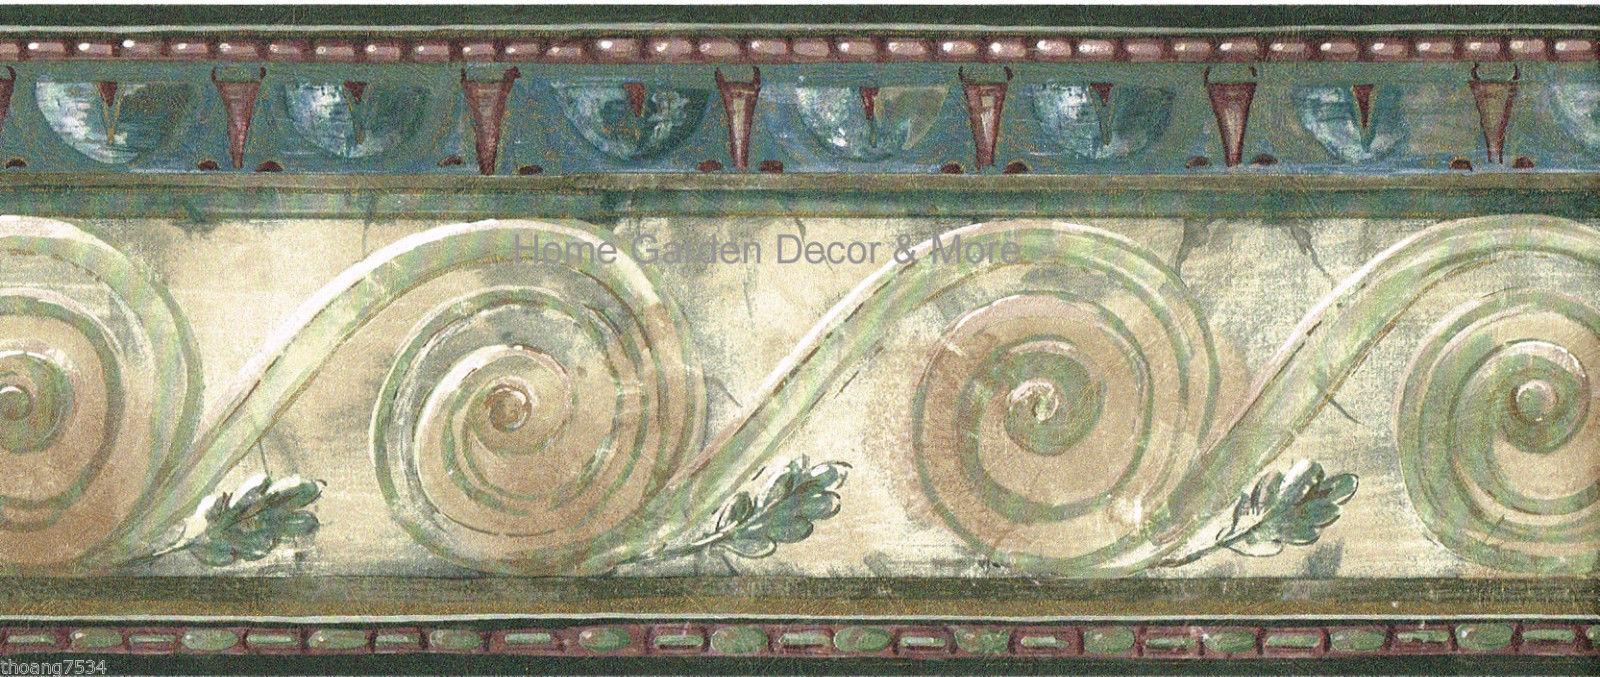 blue scroll leaf wall paper border crown molding scroll leaf wallpaper 1600x677